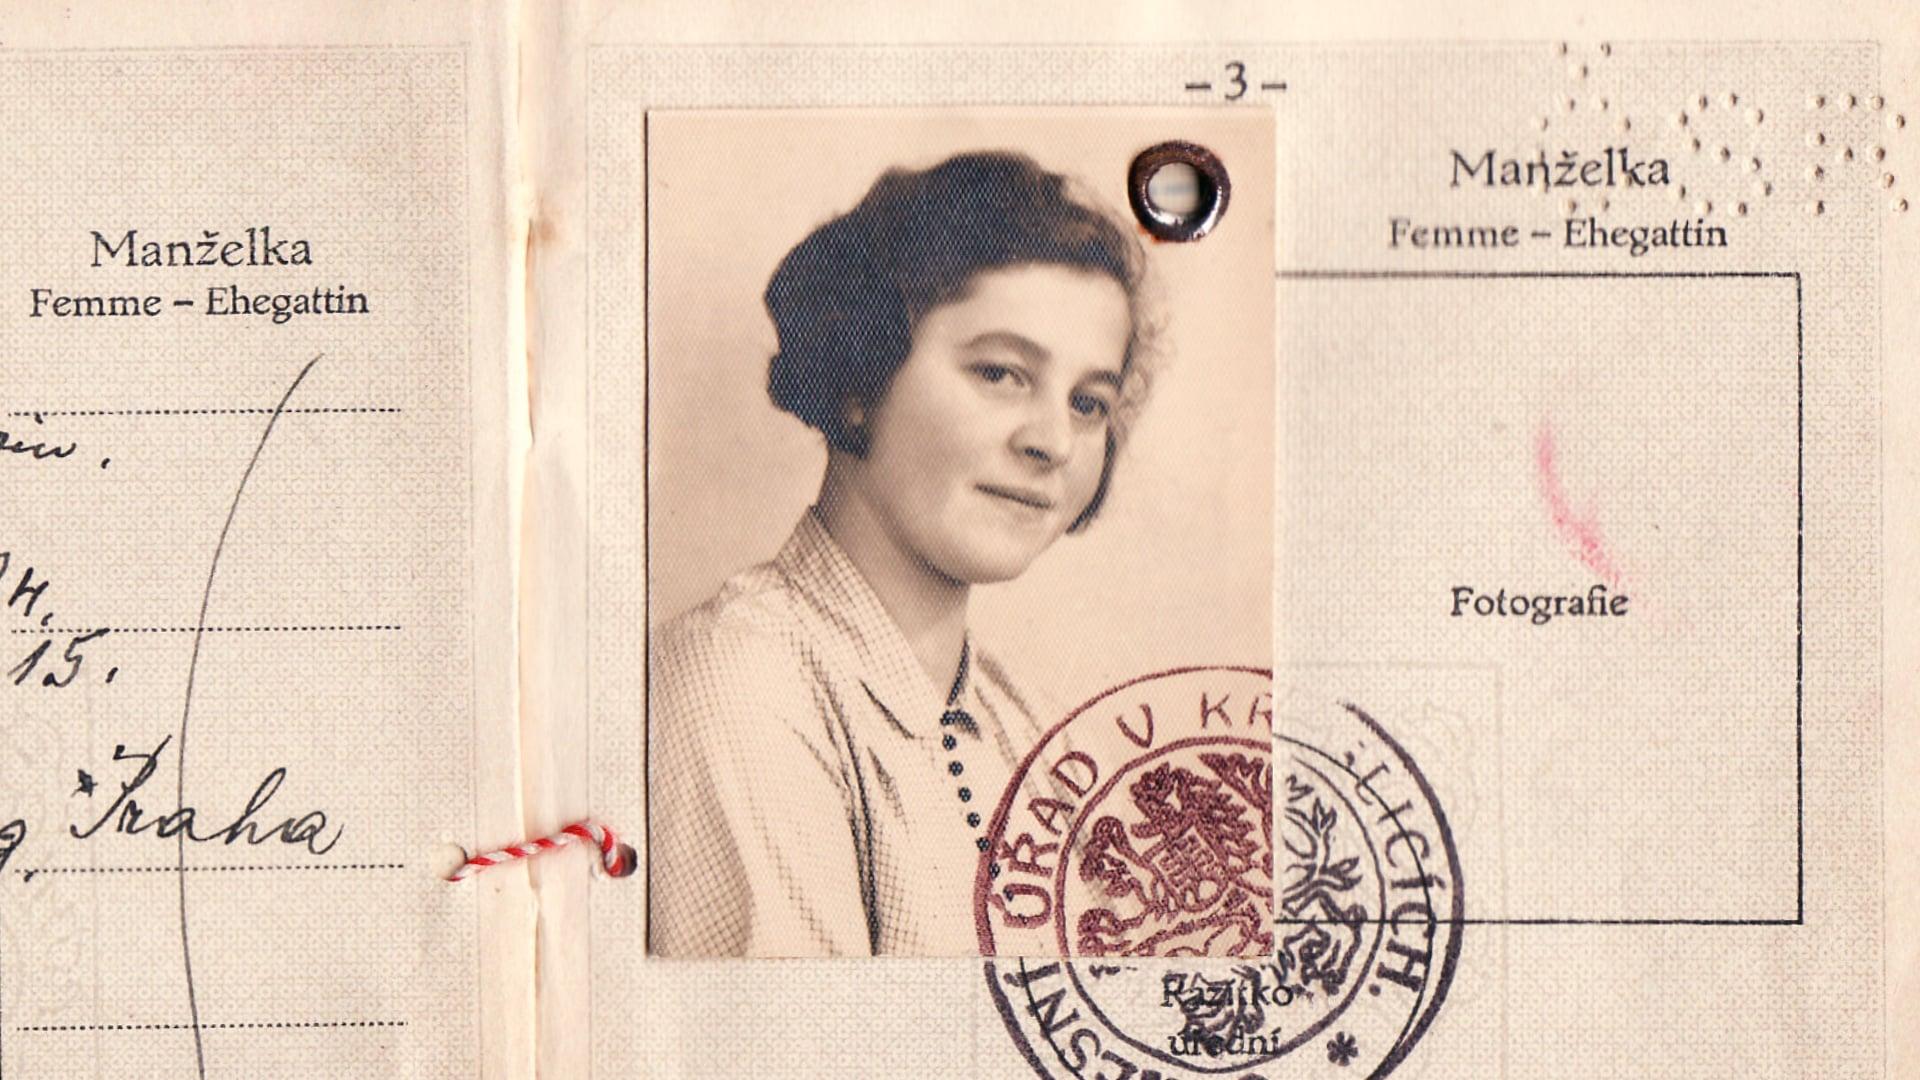 Complete Portrait Wanted of Markéta Ledererová - Trailer